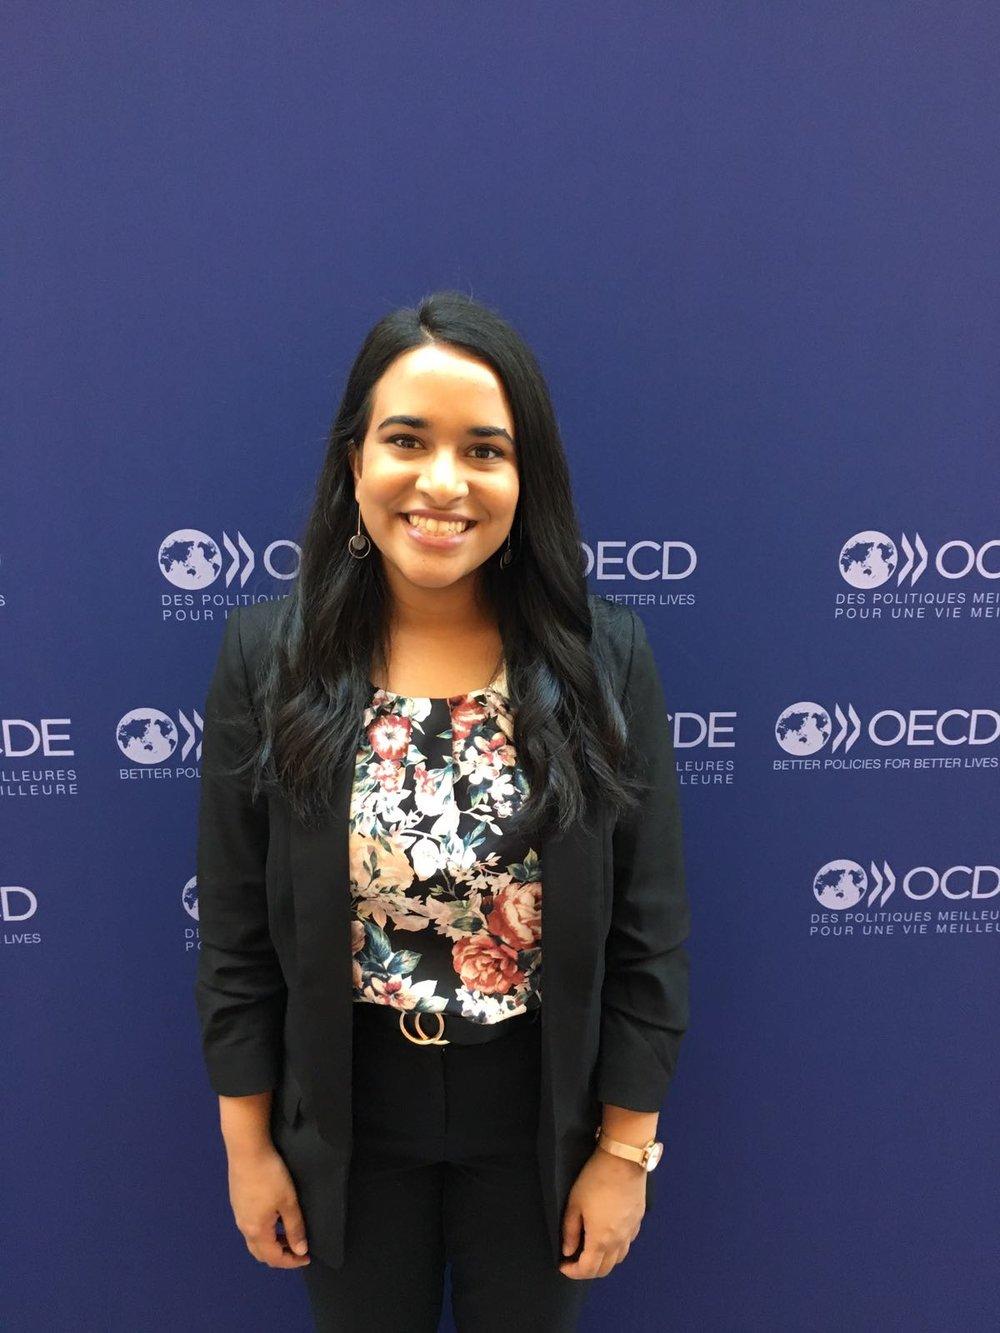 Judith Mendes OECD Headshot No. 2 copy.jpeg